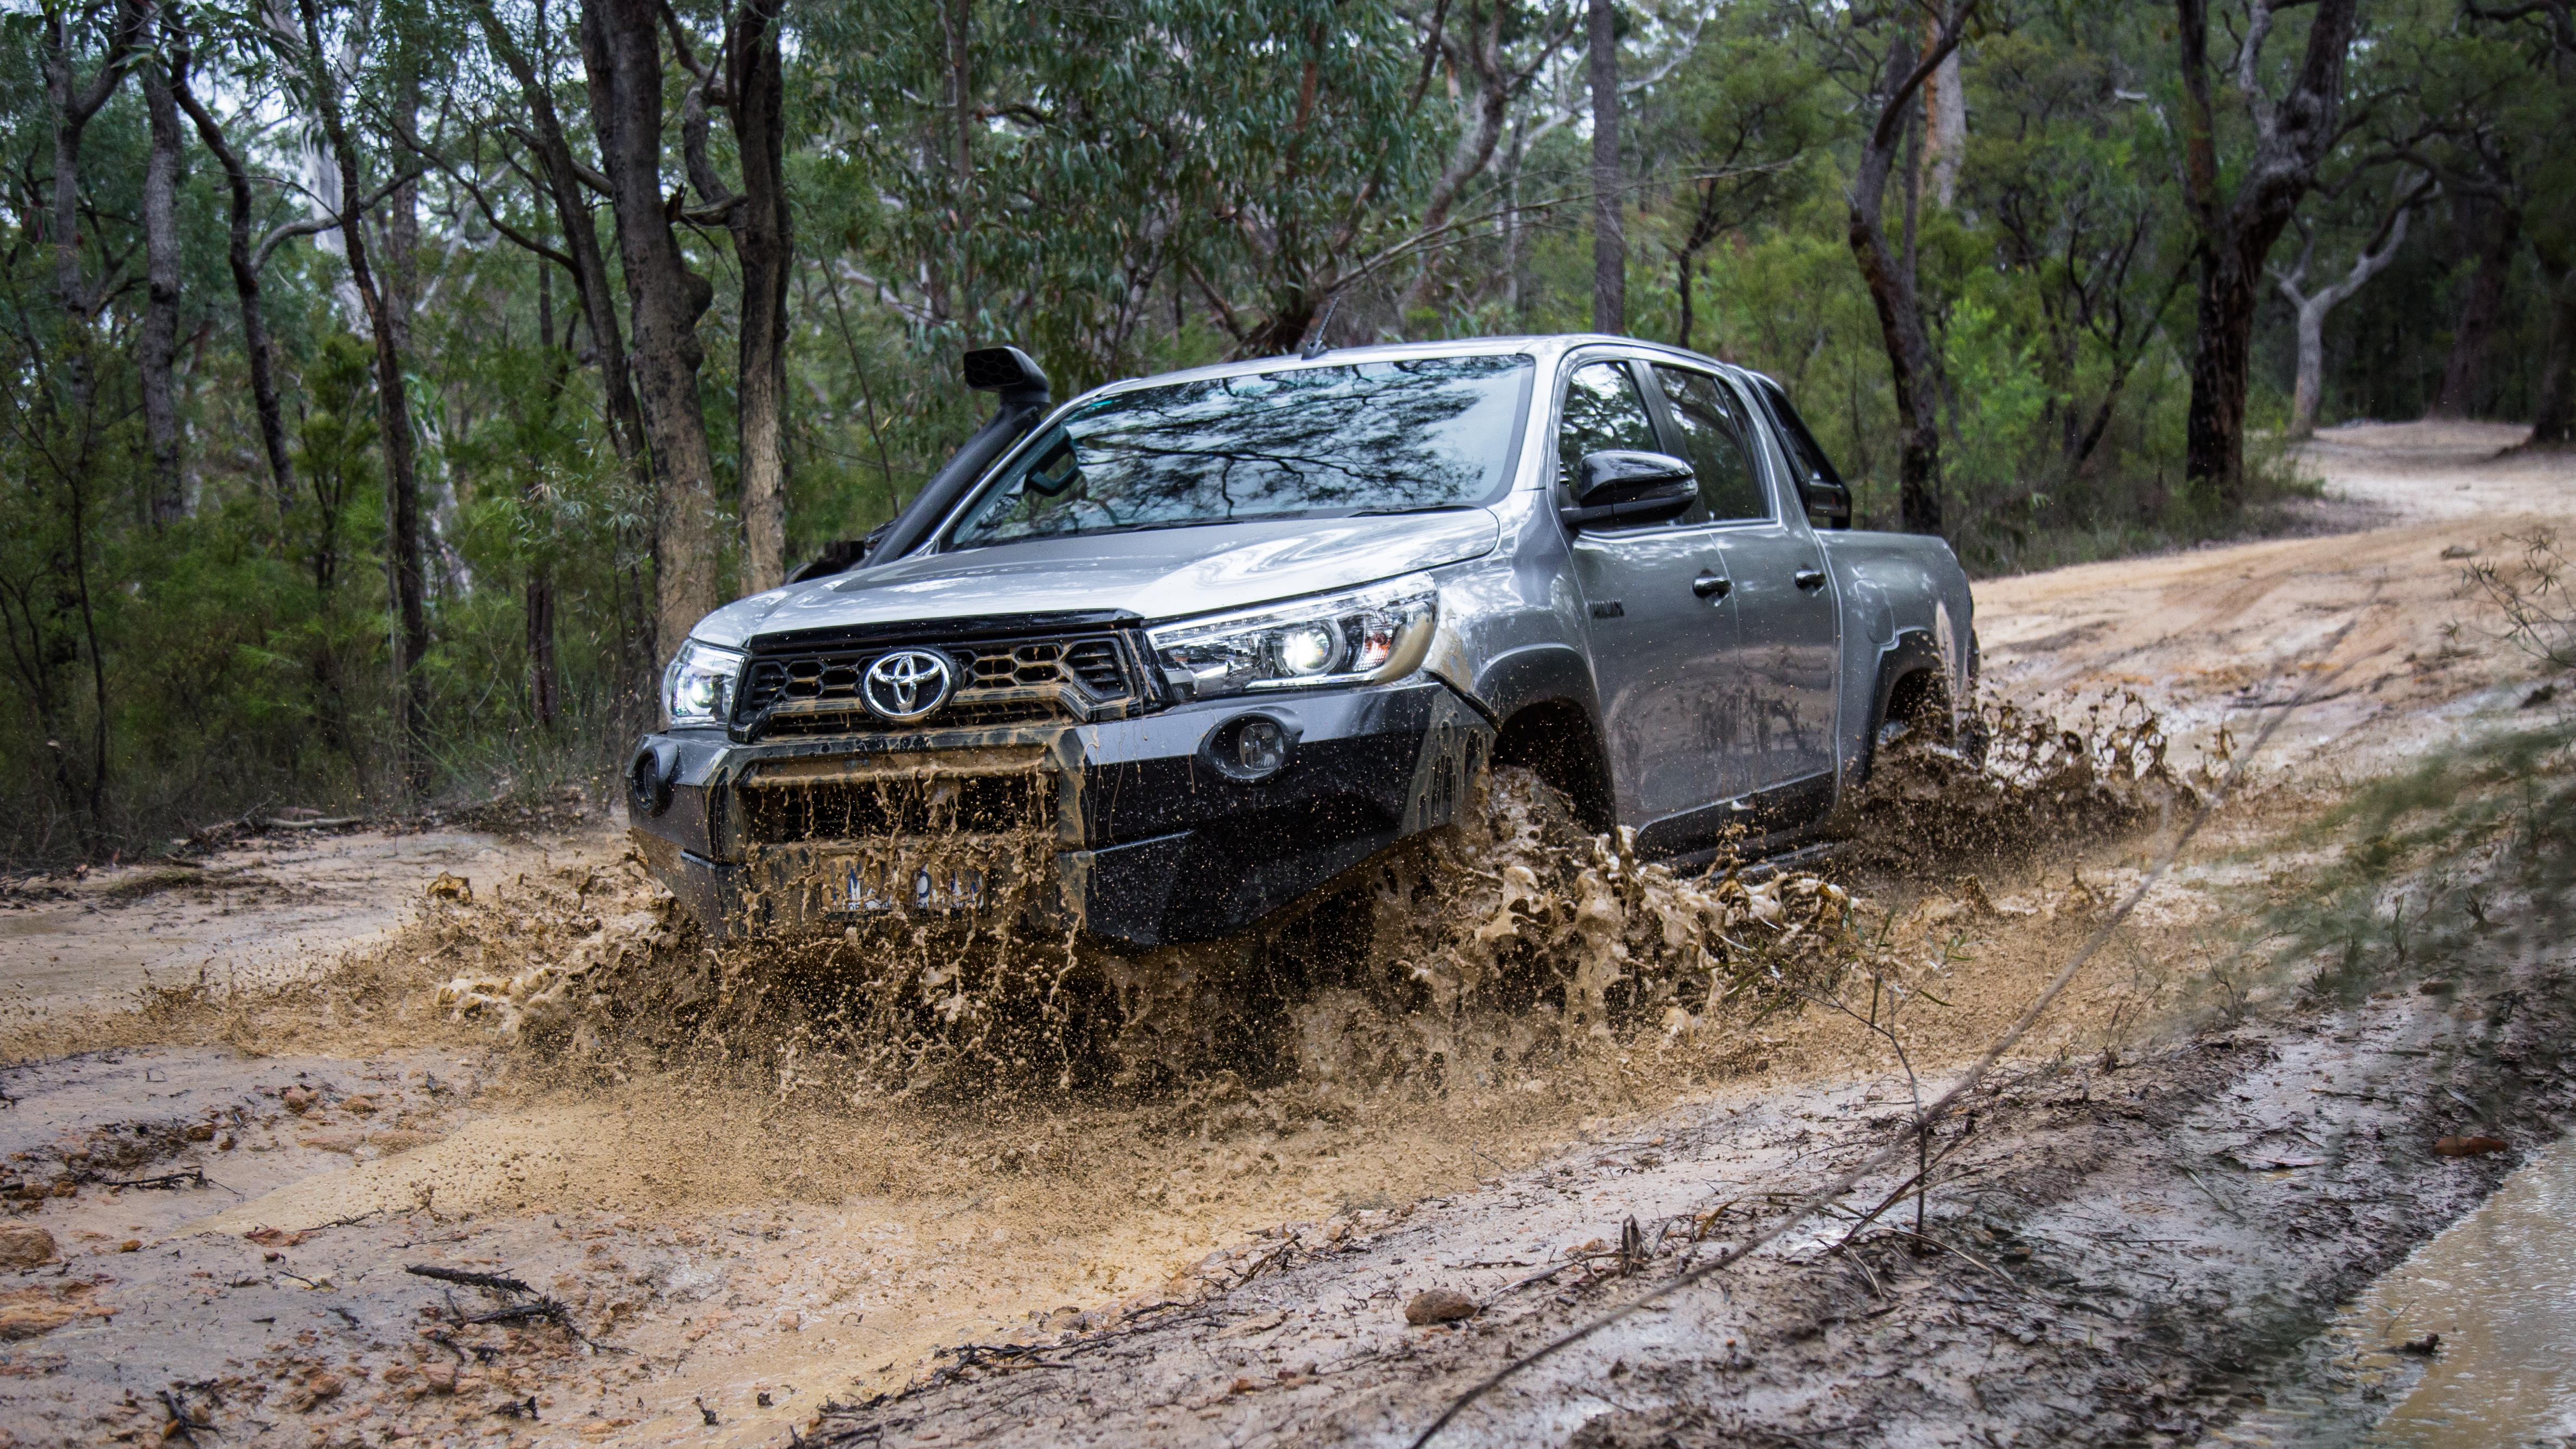 Kelebihan Toyota Hilux Offroad Perbandingan Harga